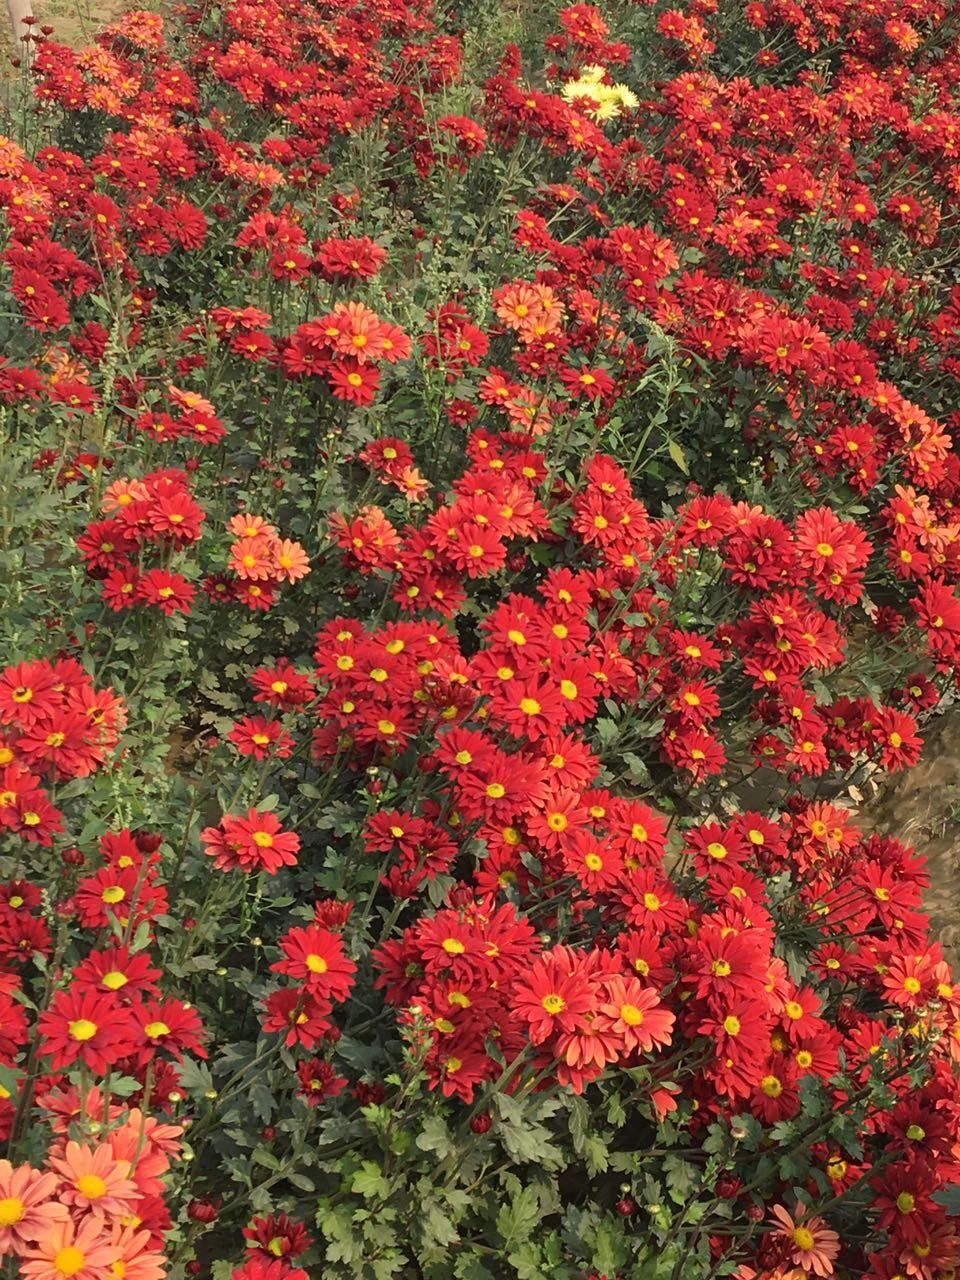 Nanil Chaudhary| Story| Flower Farm| Gladiolus| Chrysanthemum